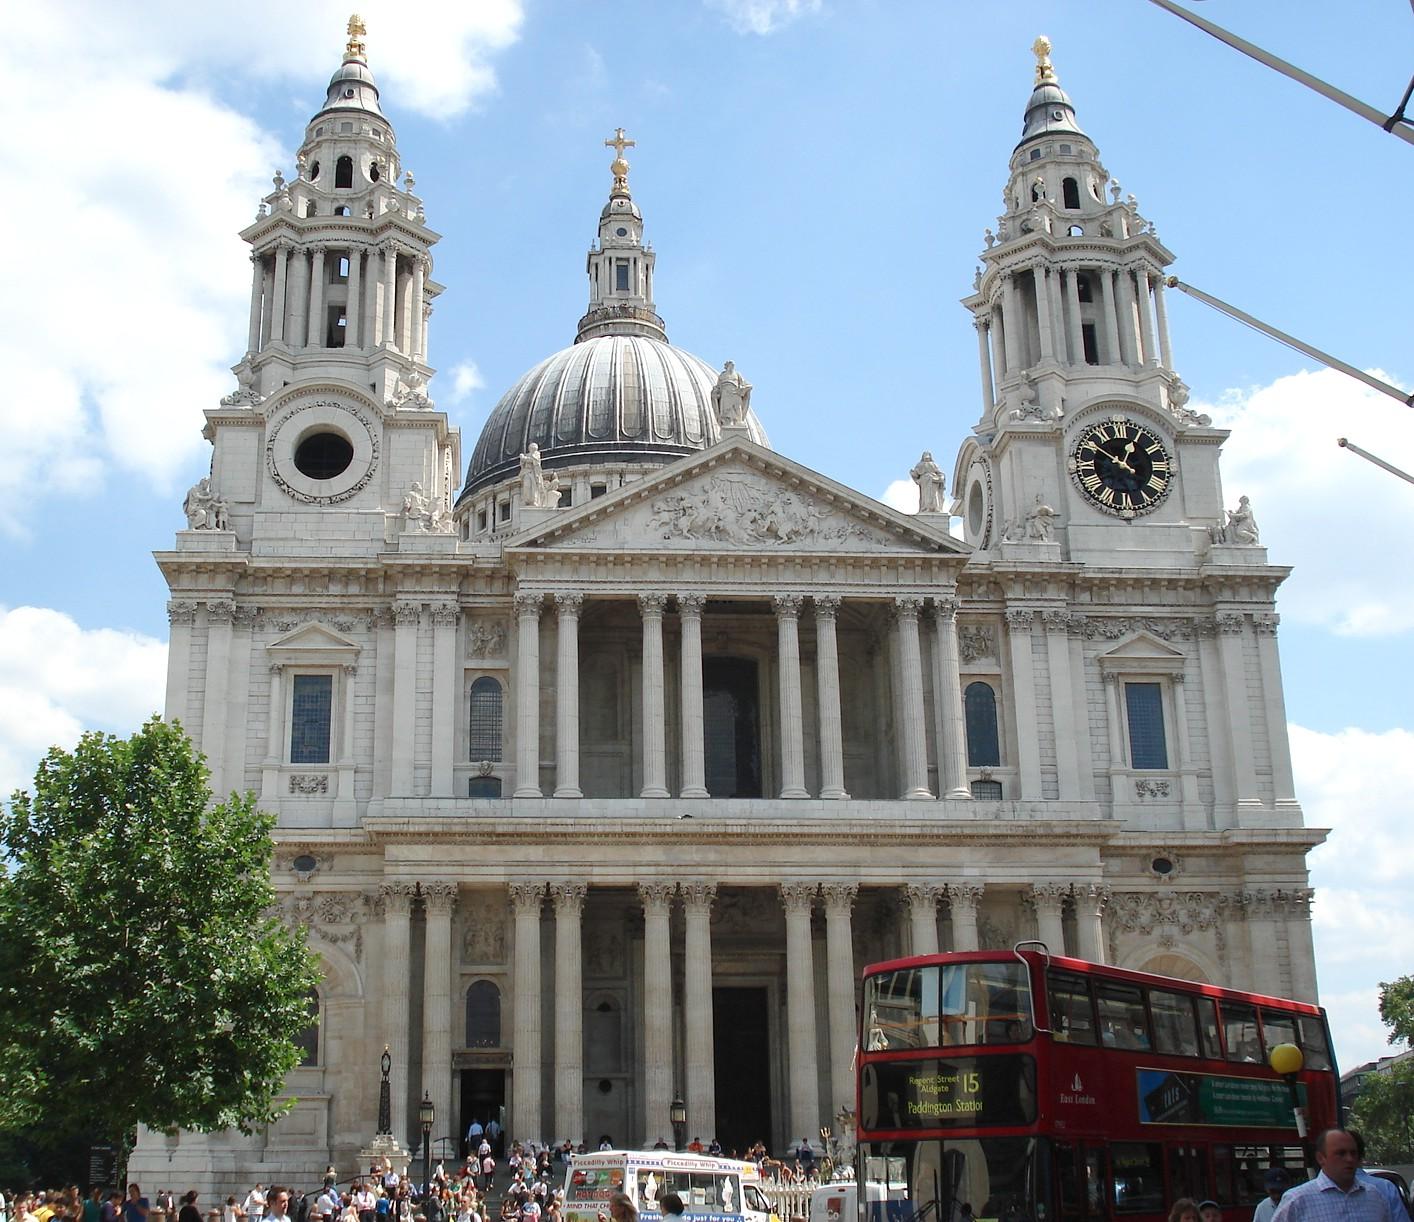 http://3.bp.blogspot.com/-d-bgN8DIzJ4/T6yCKoKMhLI/AAAAAAAAAC0/xKsRnkihmXE/s1600/st-pauls-london.jpg